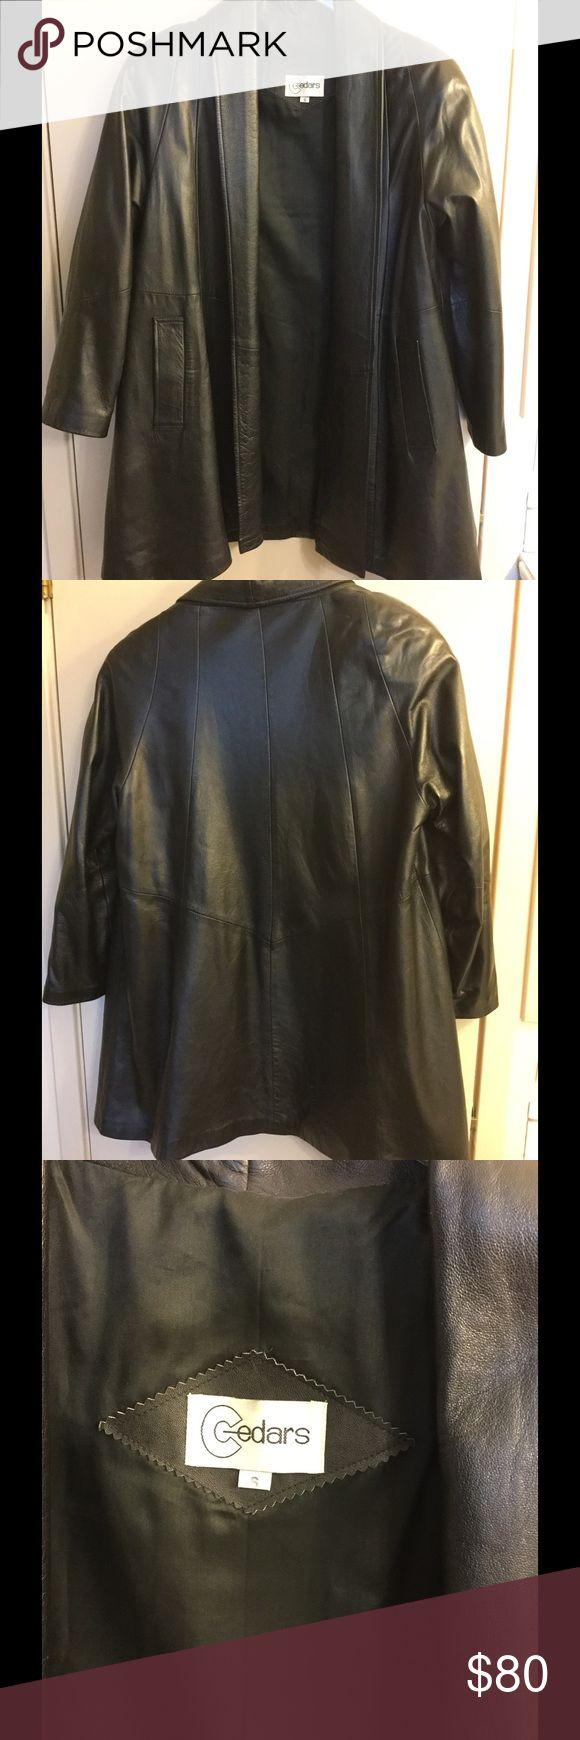 Long Leather Jacket Long Leather Jacket Cedars Jackets & Coats